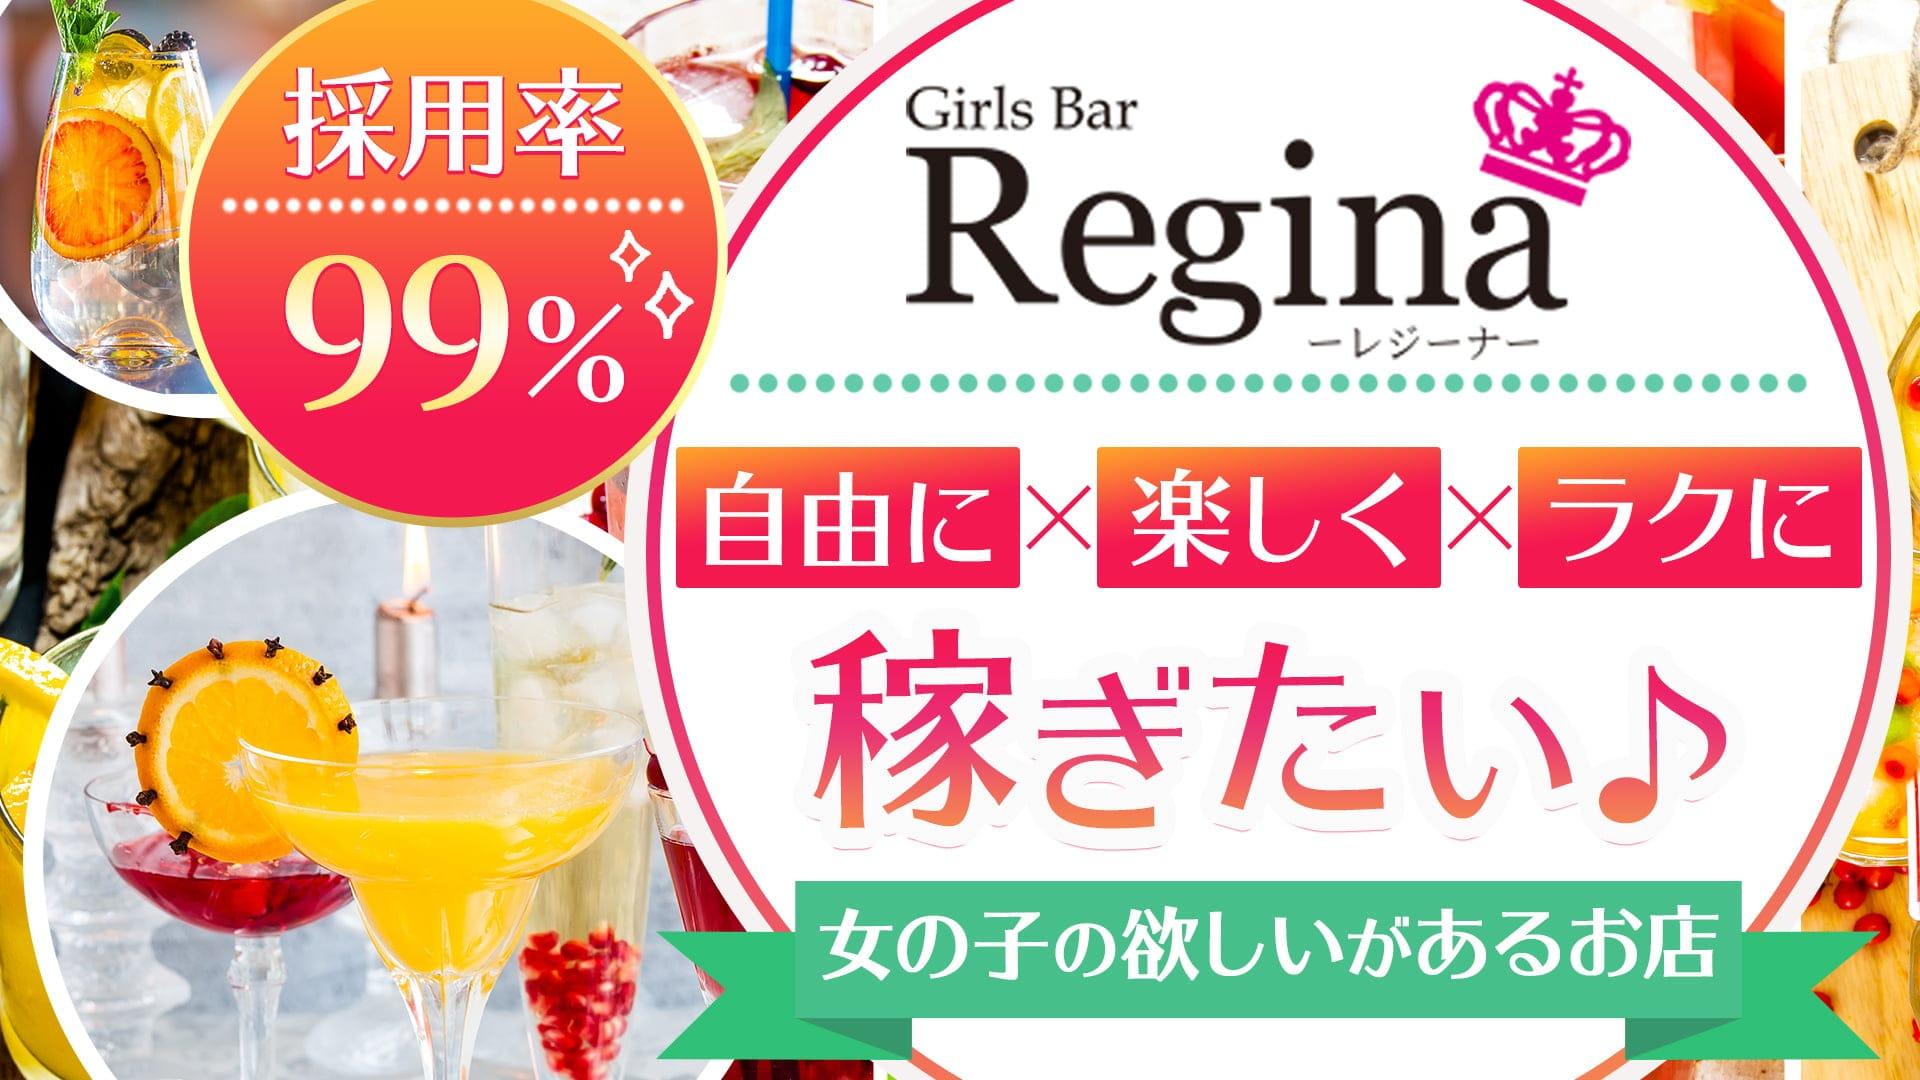 Girl's Bar Regina(レジーナ)【公式求人・体入情報】 中洲ガールズバー TOP画像